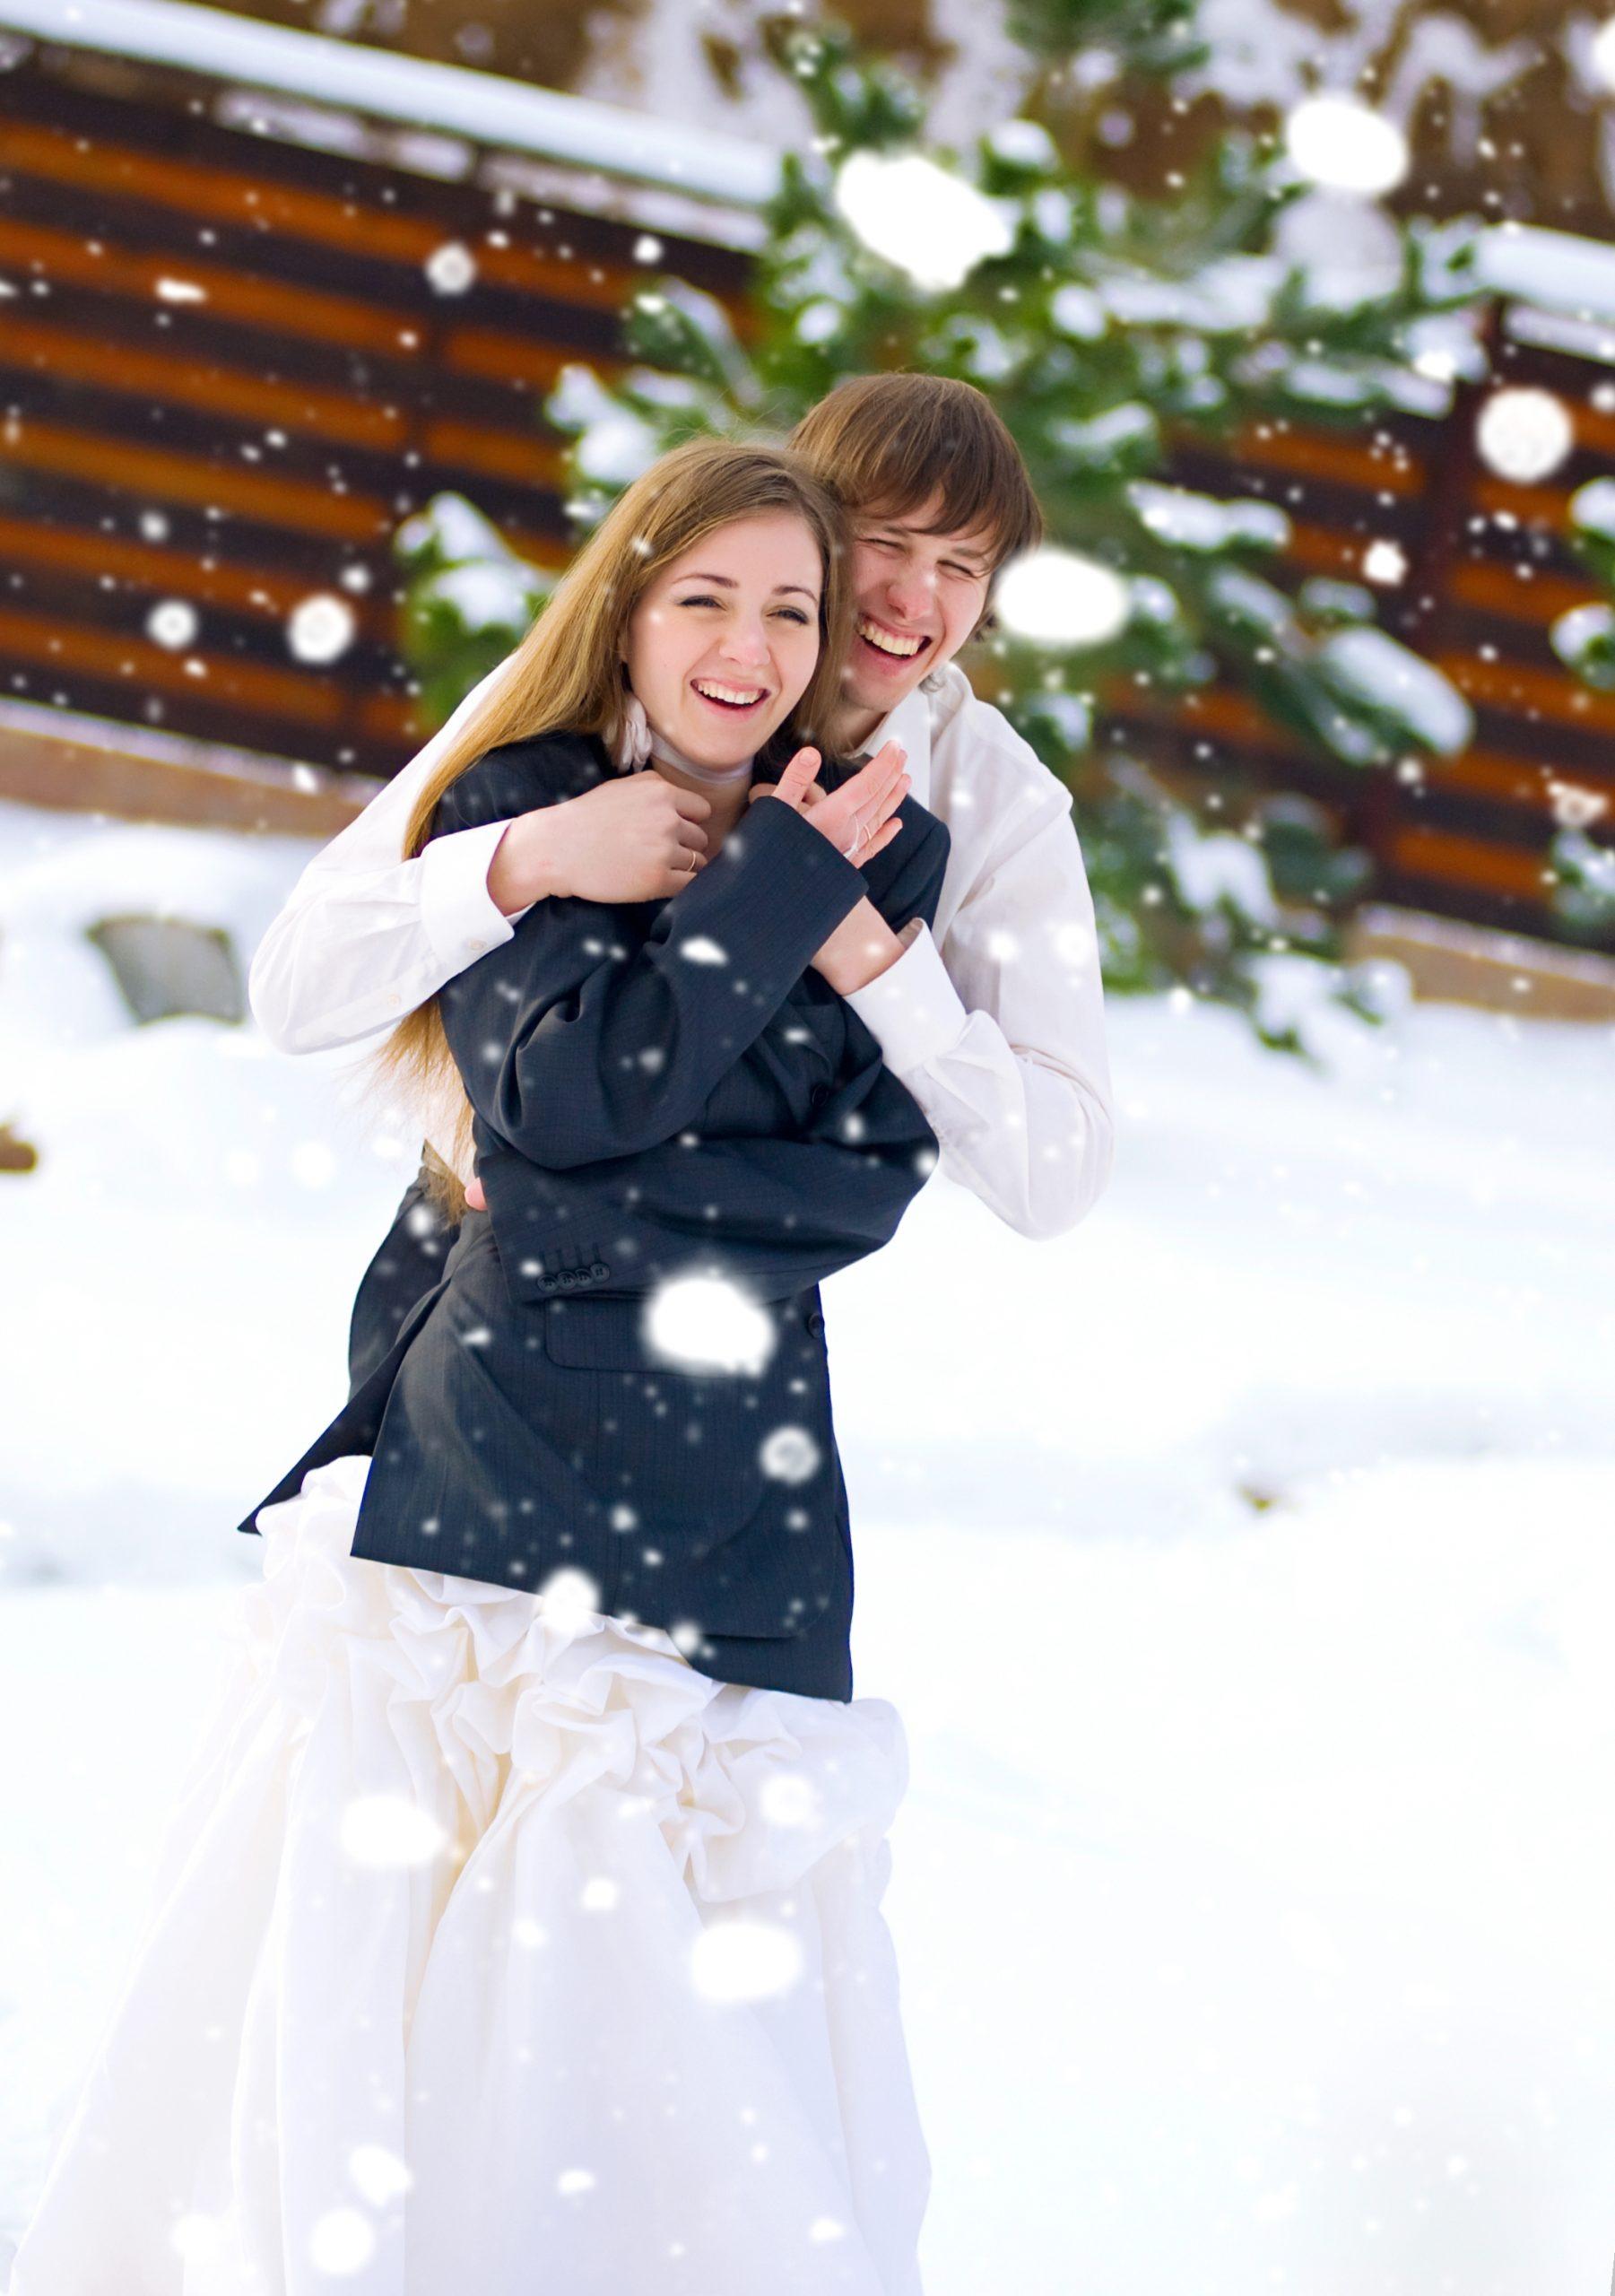 Snow Party Wedding